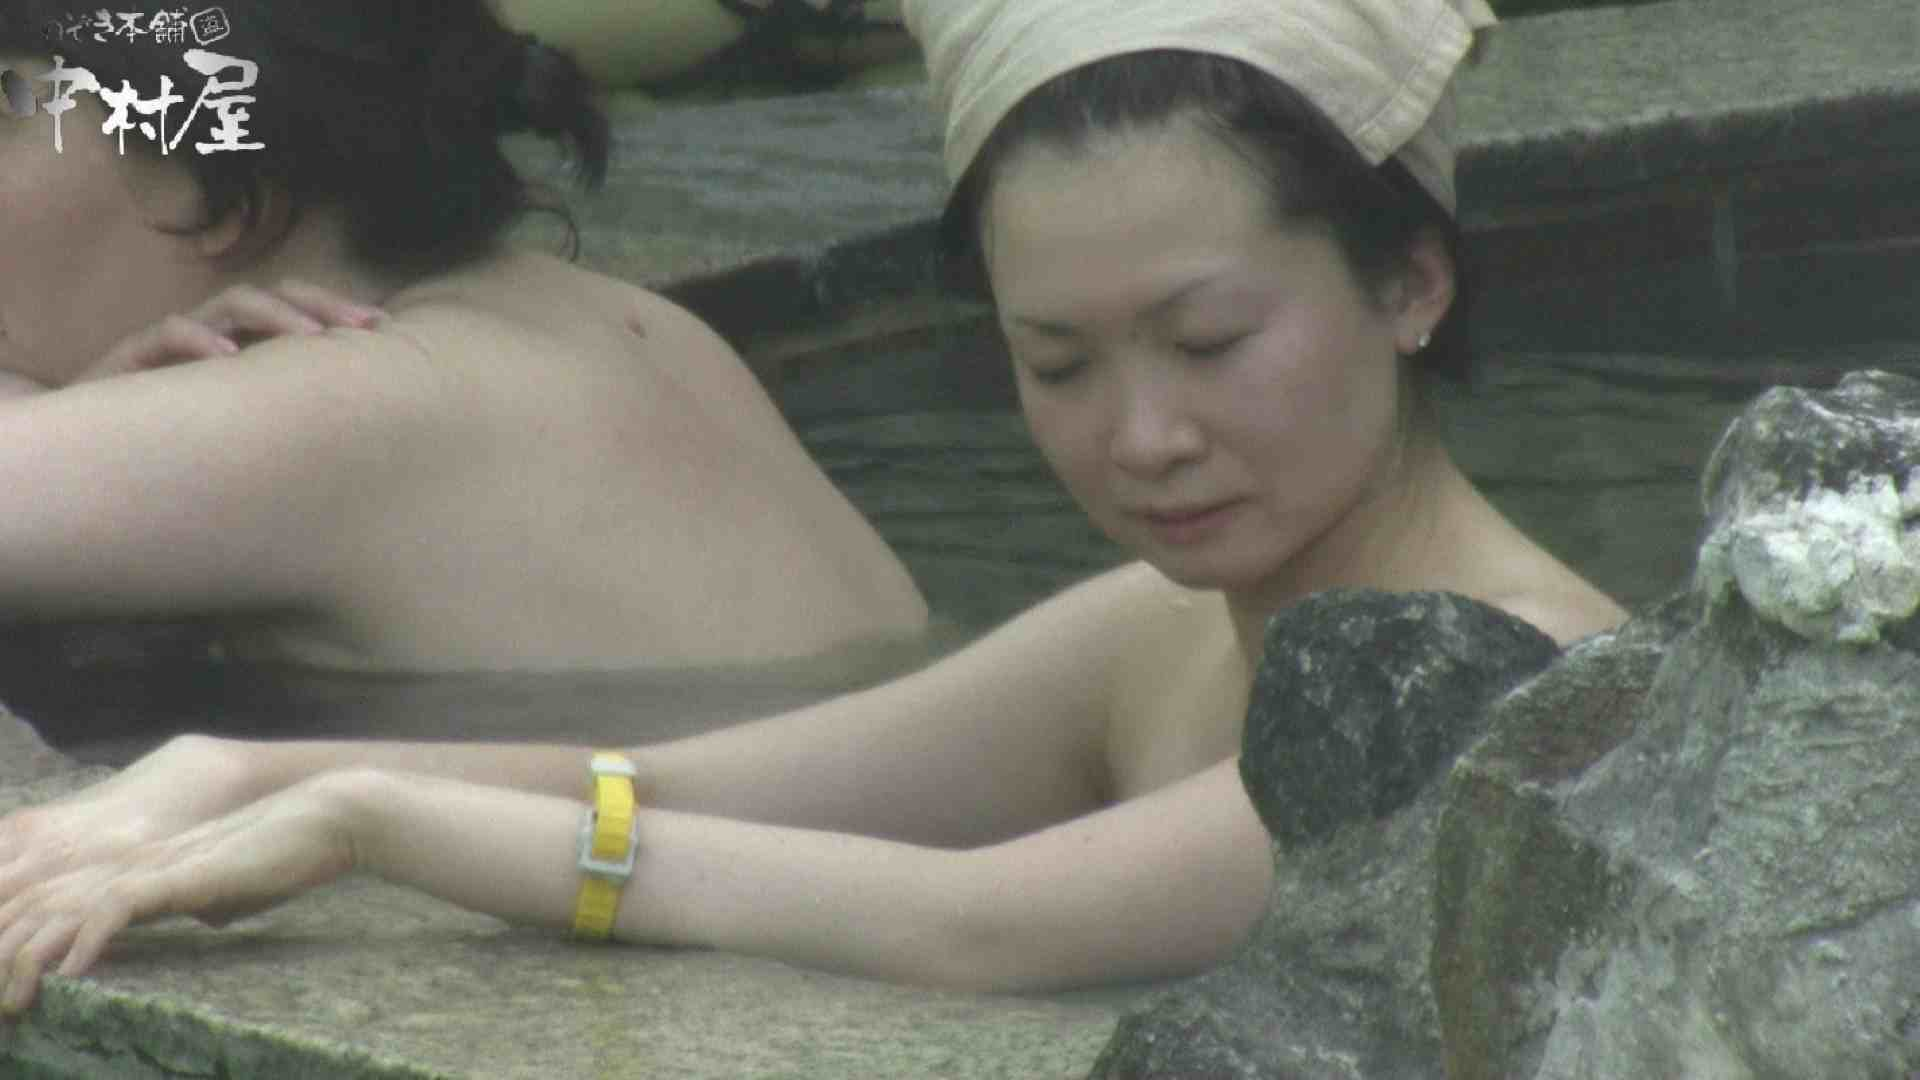 Aquaな露天風呂Vol.906 露天風呂編 | 盗撮シリーズ  86PIX 51